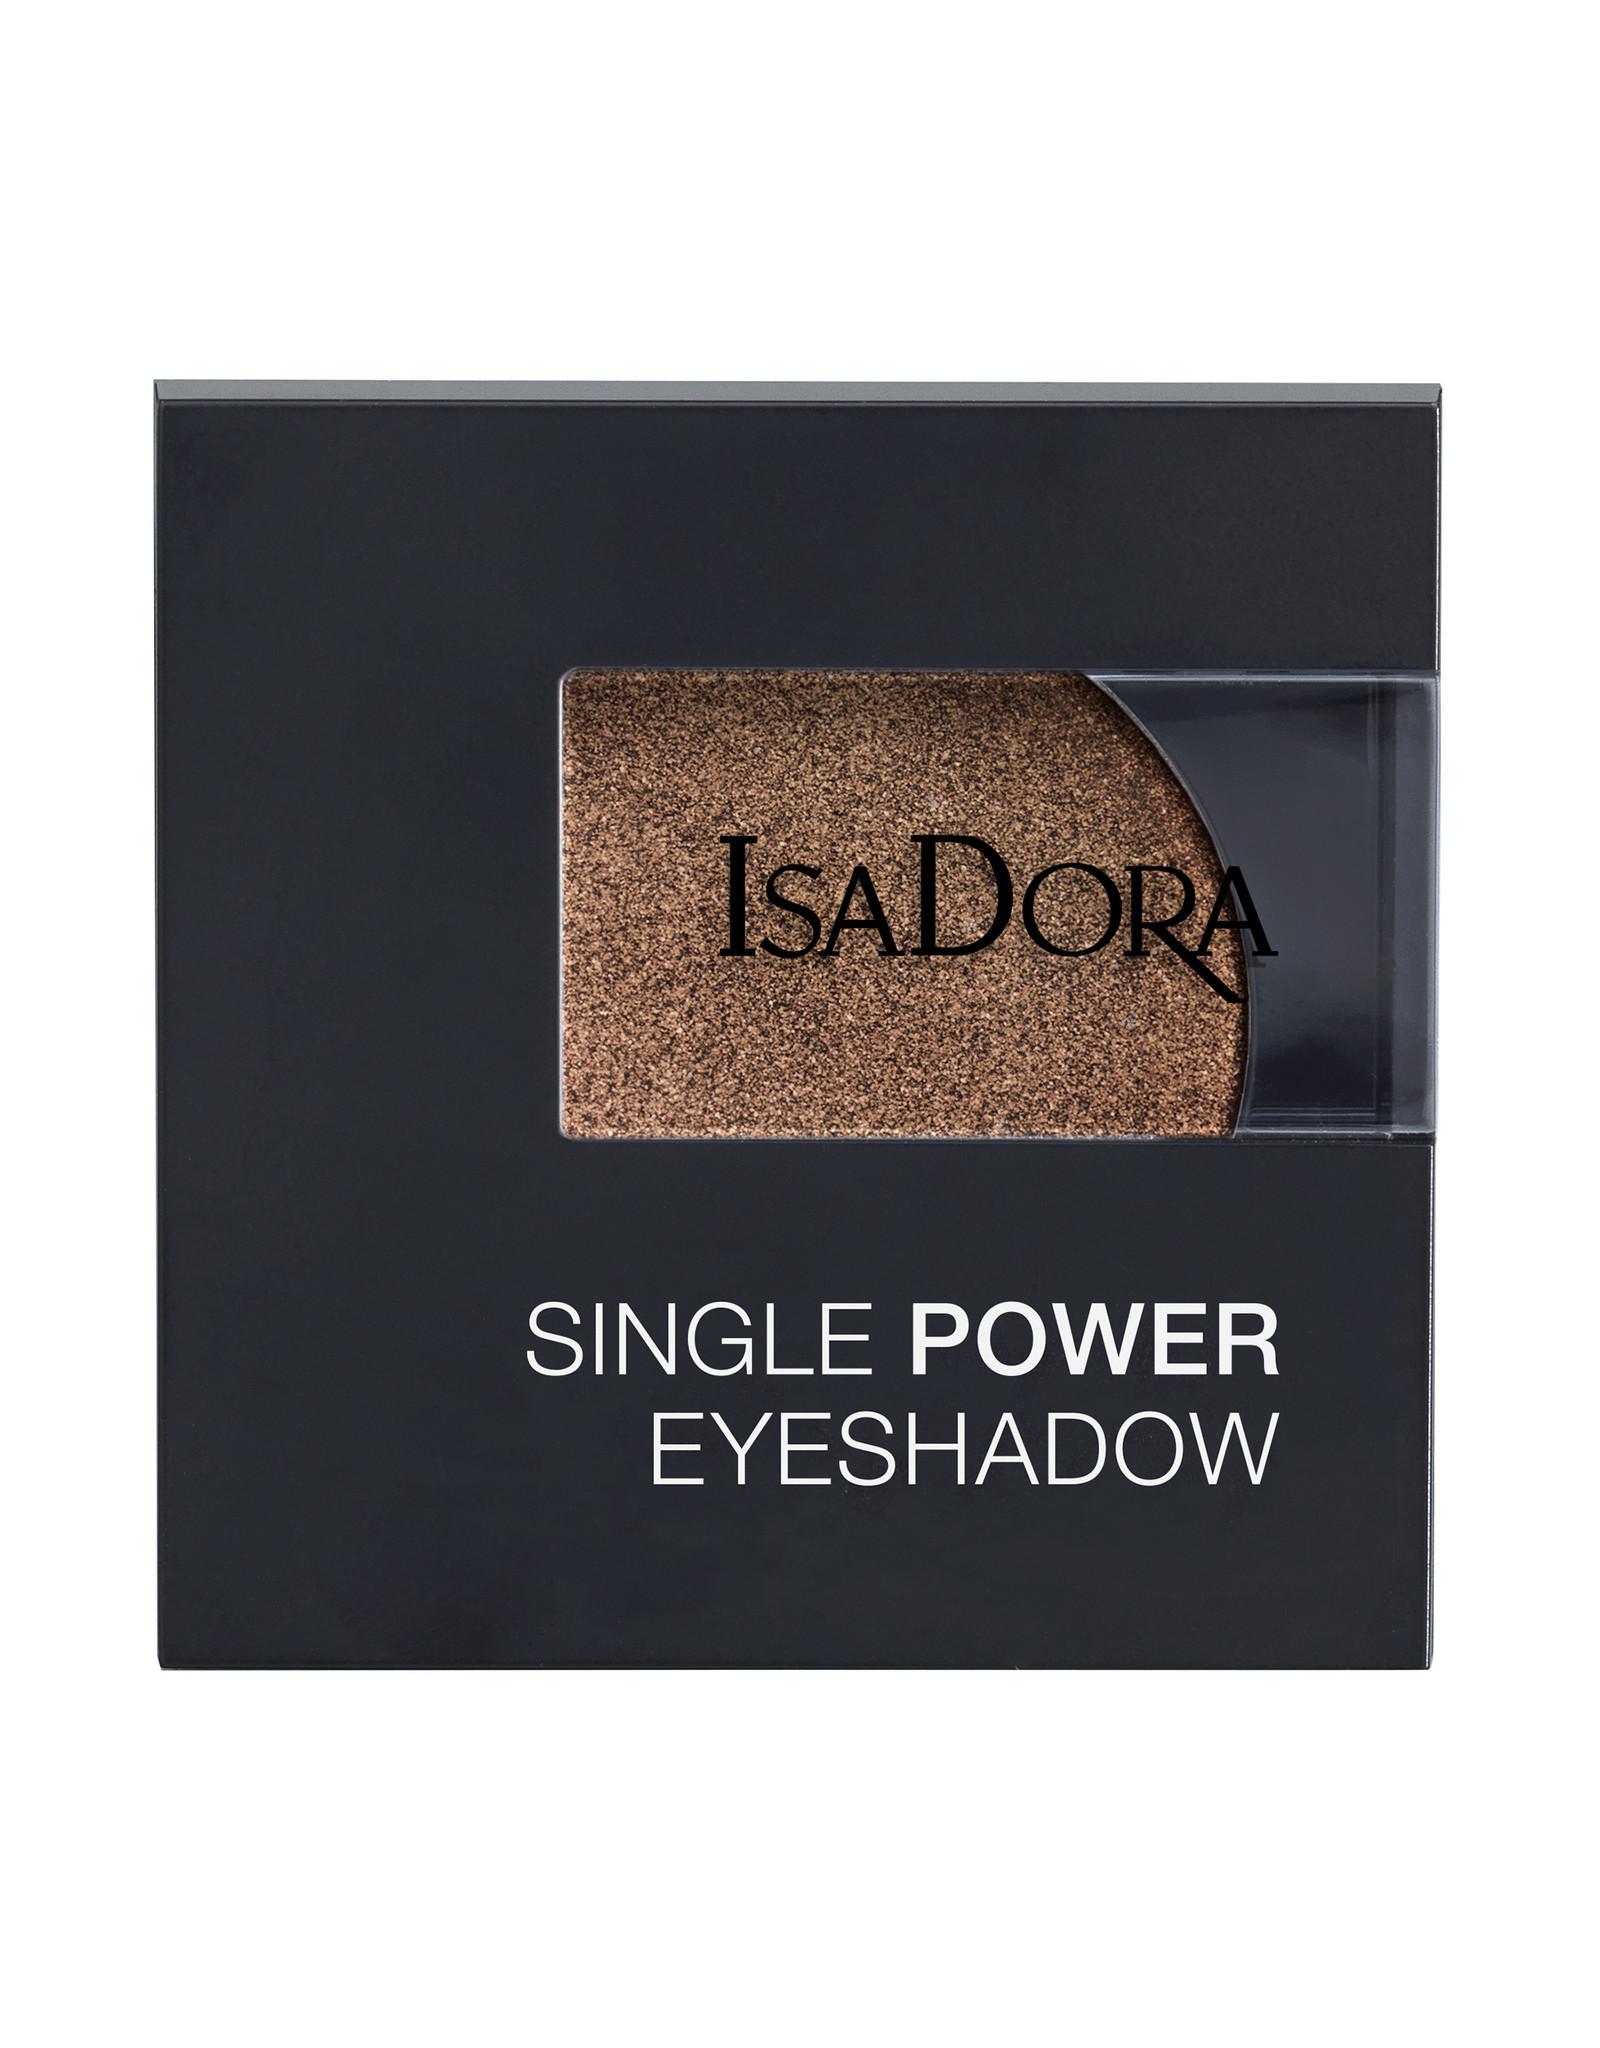 Isadora Vintage Gold 14 - Single Power Eyeshadow - Isadora